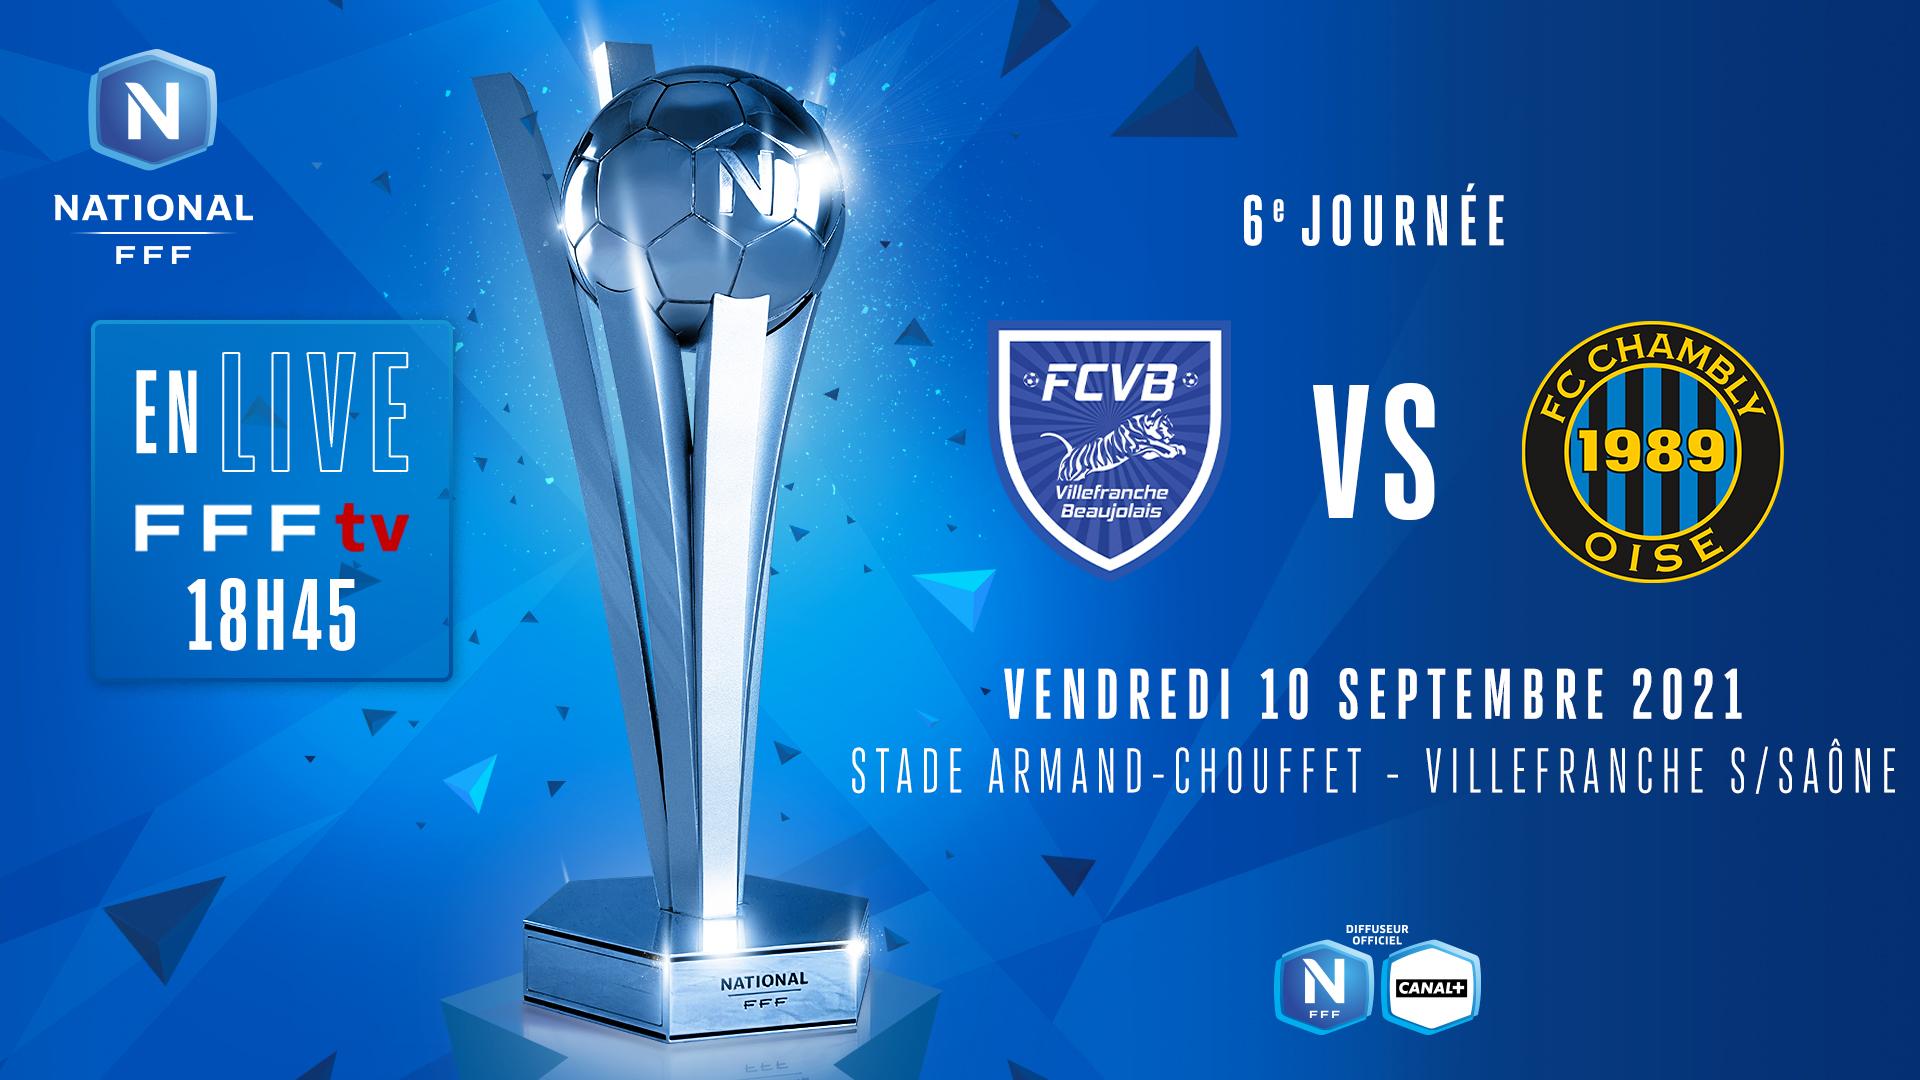 J6 : FC VILLEFRANCHE B. - FC CHAMBLY OISE EN DIRECT (18h45) !